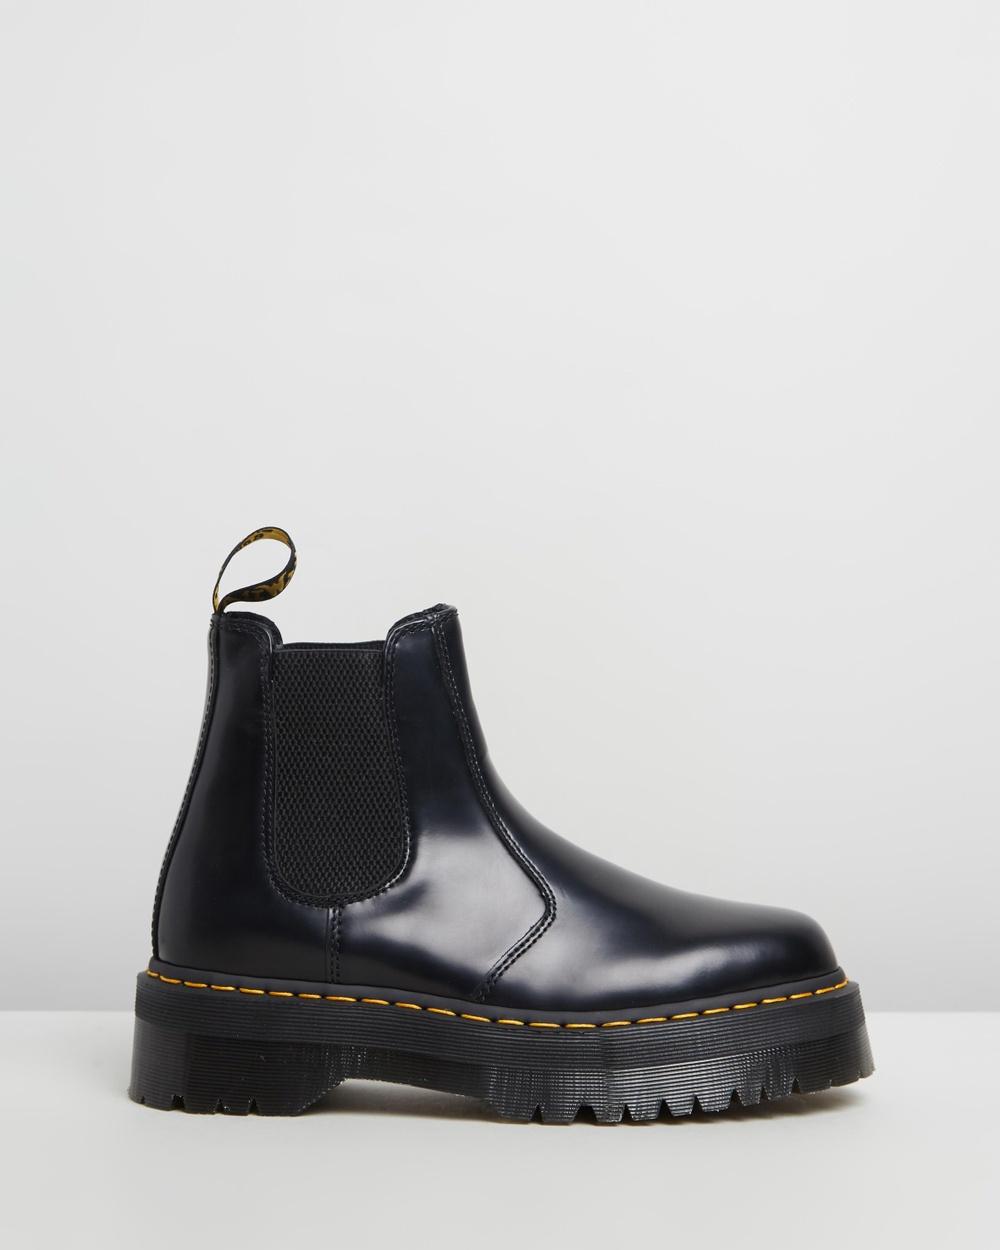 Dr Martens Unisex 2976 Quad Leather Platform Chelsea Boots Black Polished Smooth Australia